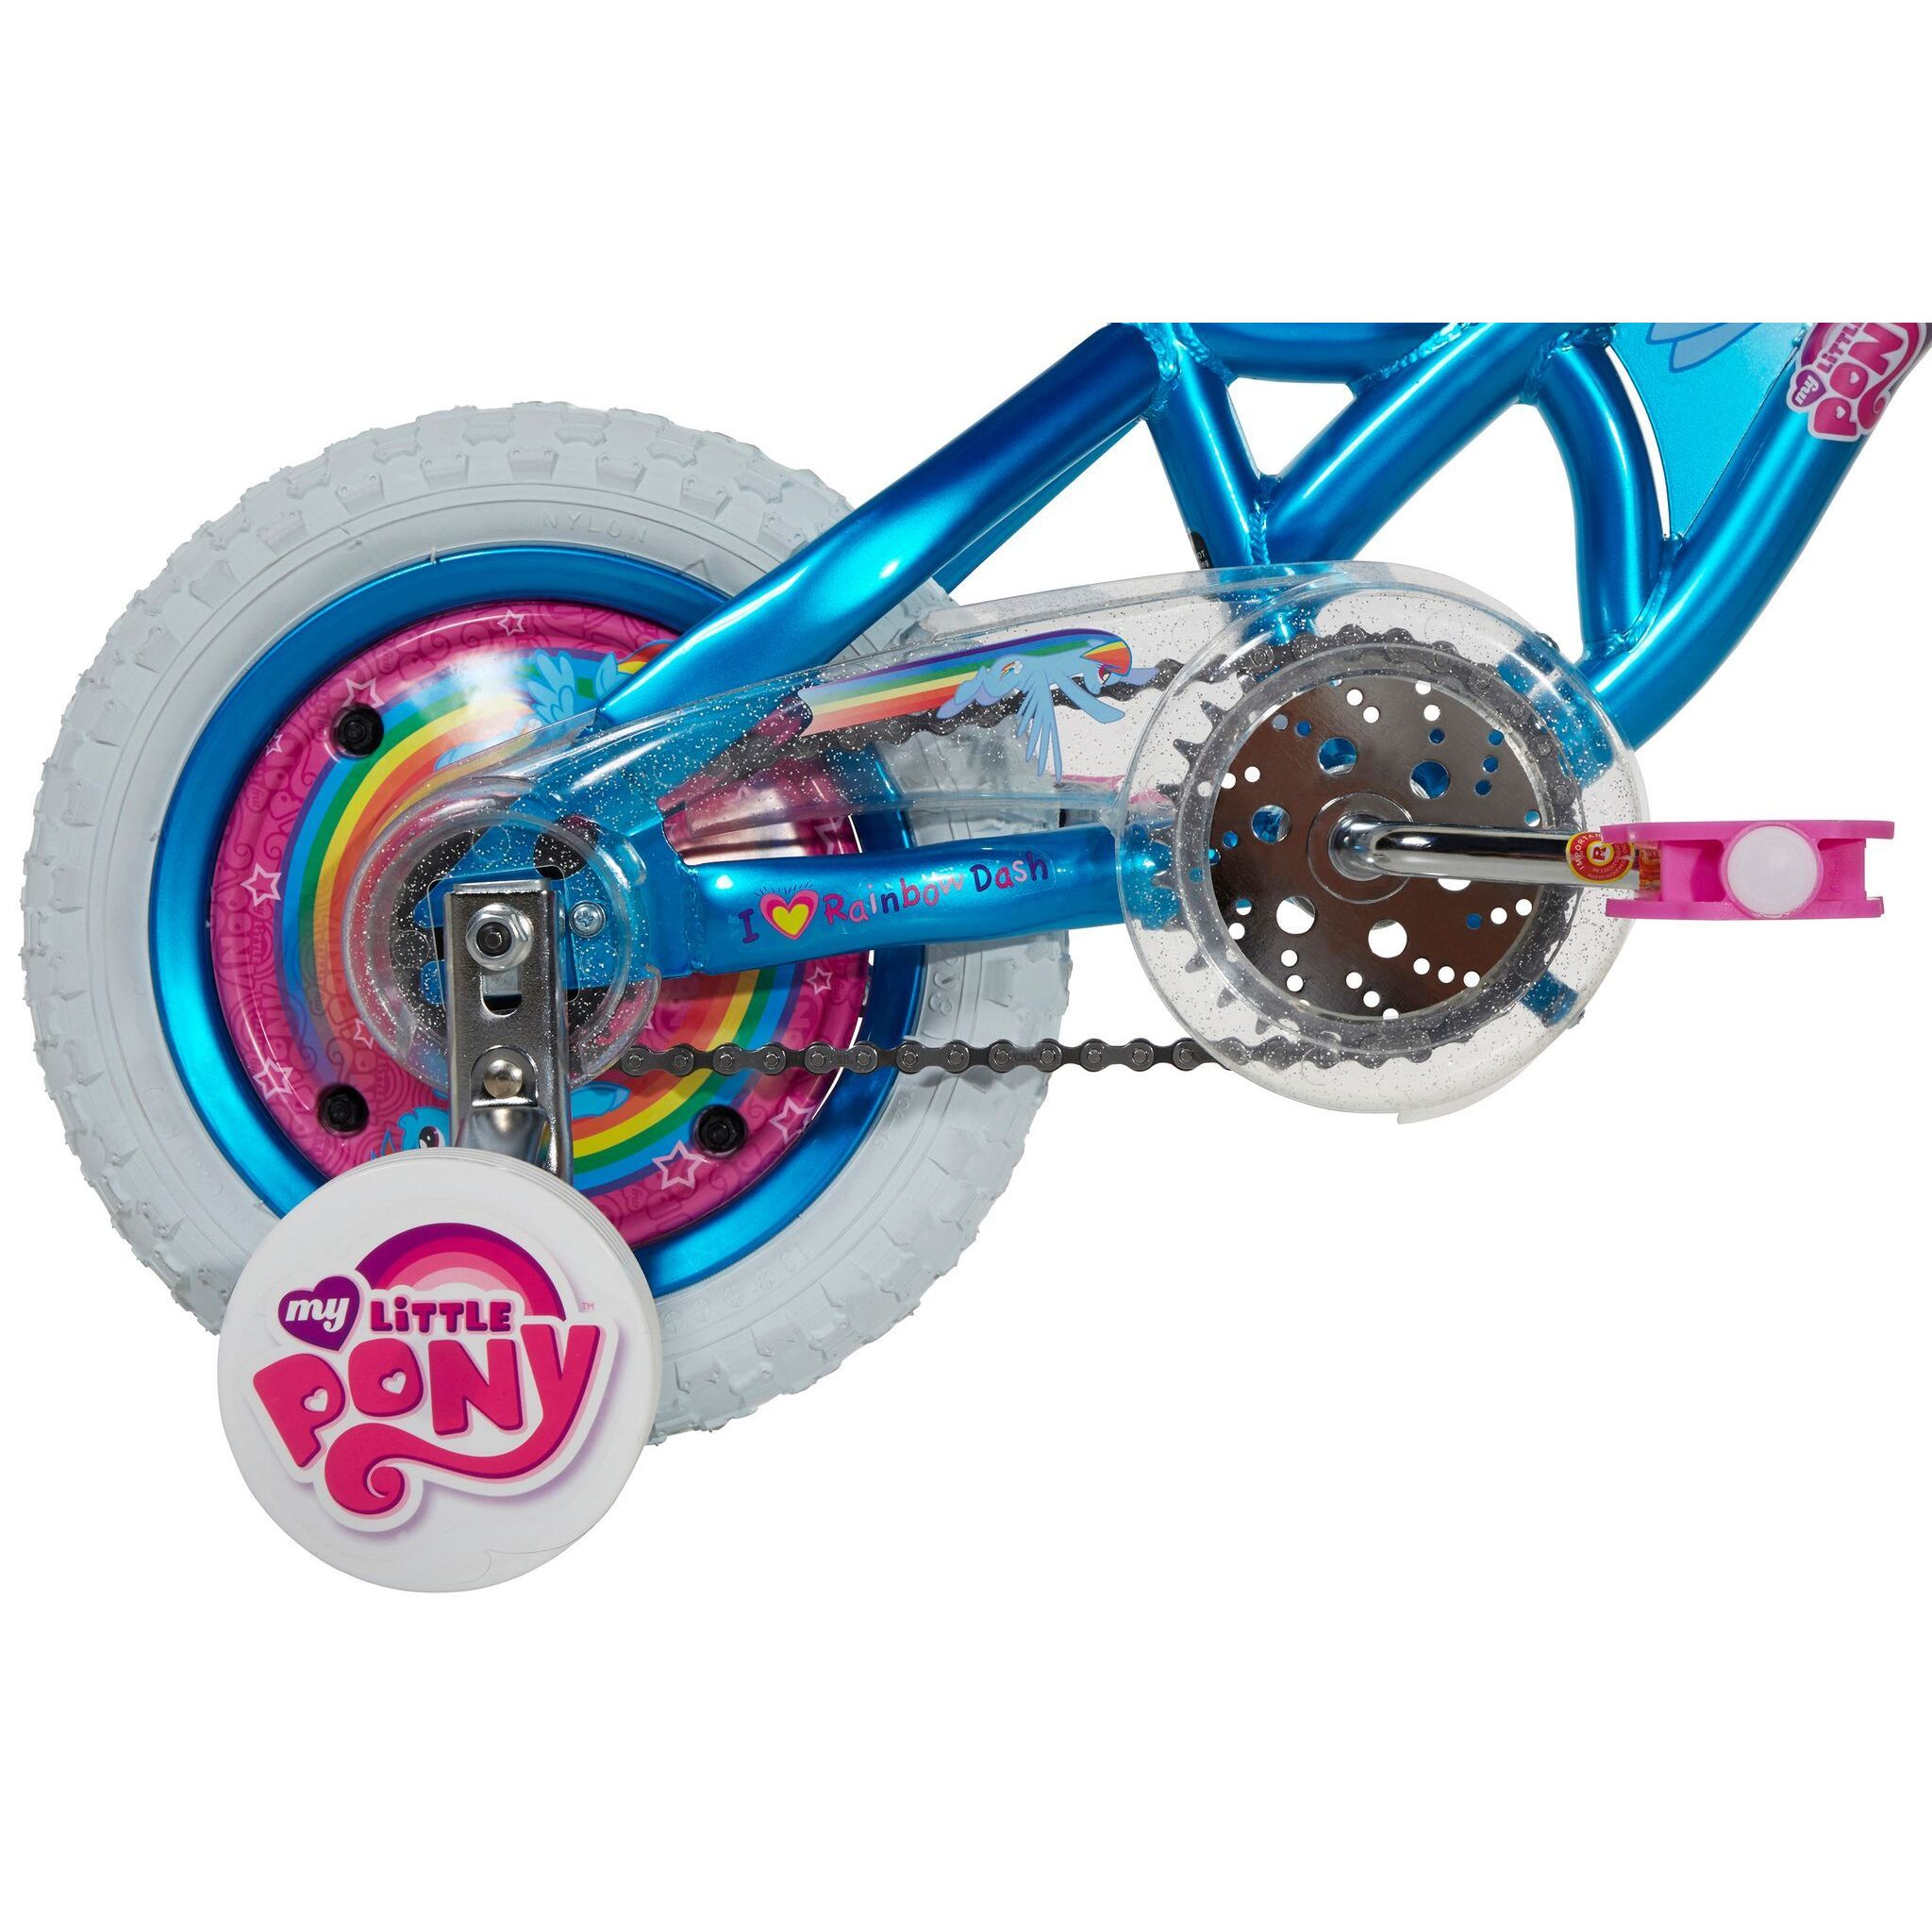 aa85f6a5da7 Shop Dynacraft My Little Pony Steel 12-inch Bike - Free Shipping Today -  Overstock - 13434436